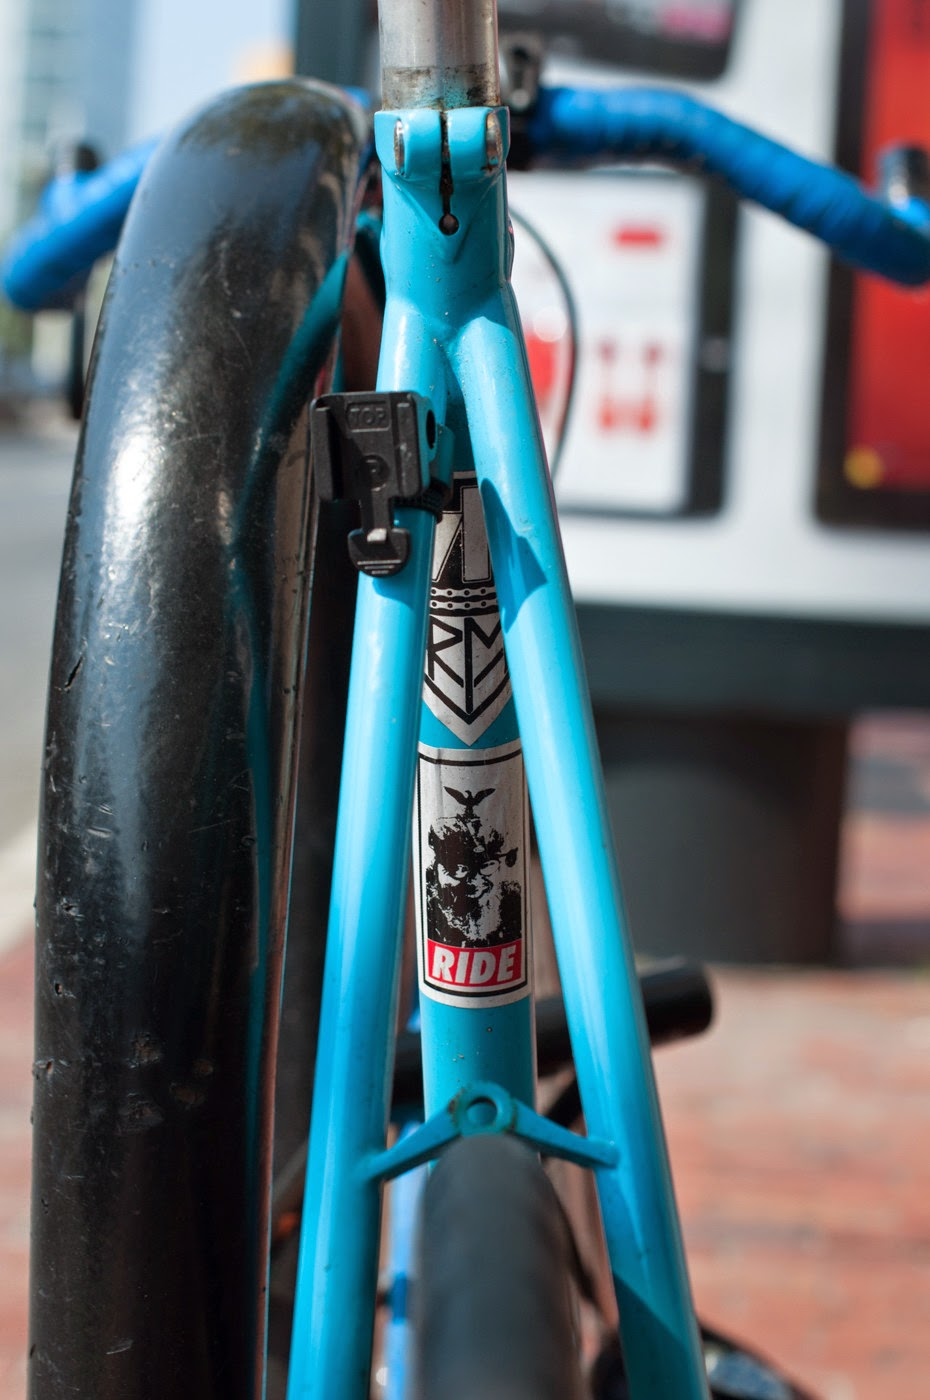 Fixie, fixed speed, bicycle, boston, USA, custom, customised, blue, tim Macauley, the biketorialist, shimano, frame, 3t, ritchey, tiagra , decal, sticker, ride